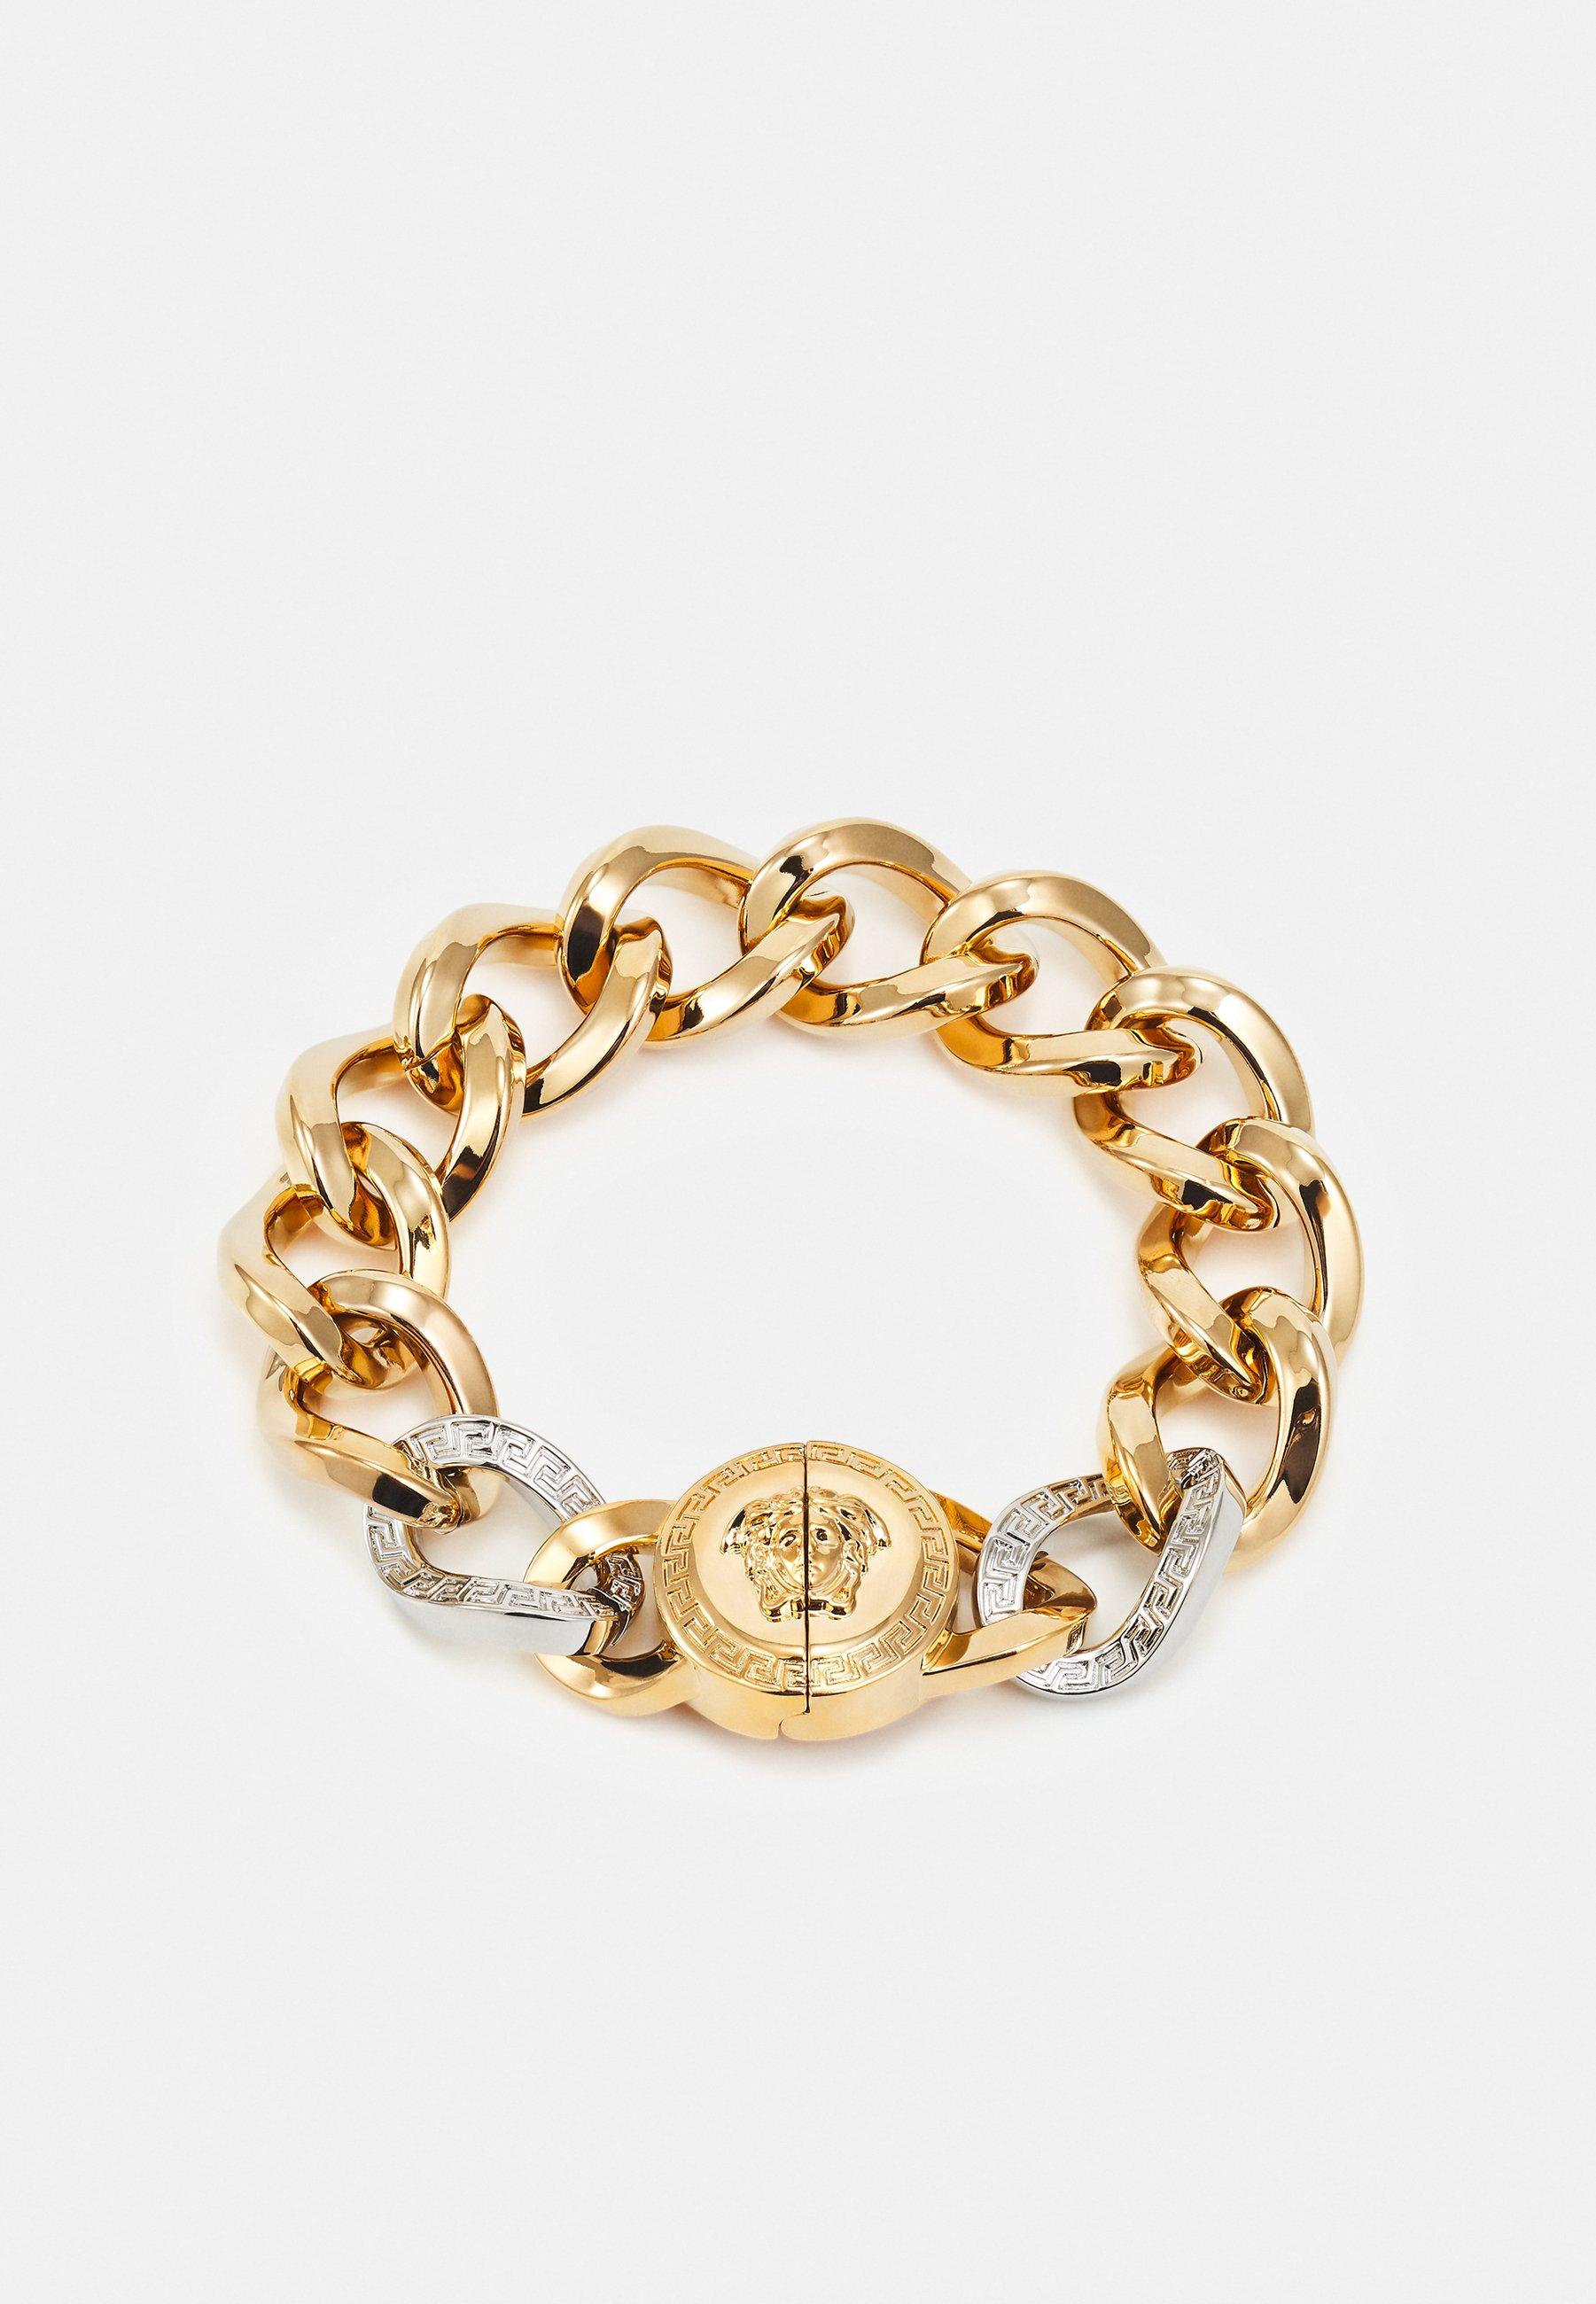 Homme FASHION JEWELRY - Bracelet